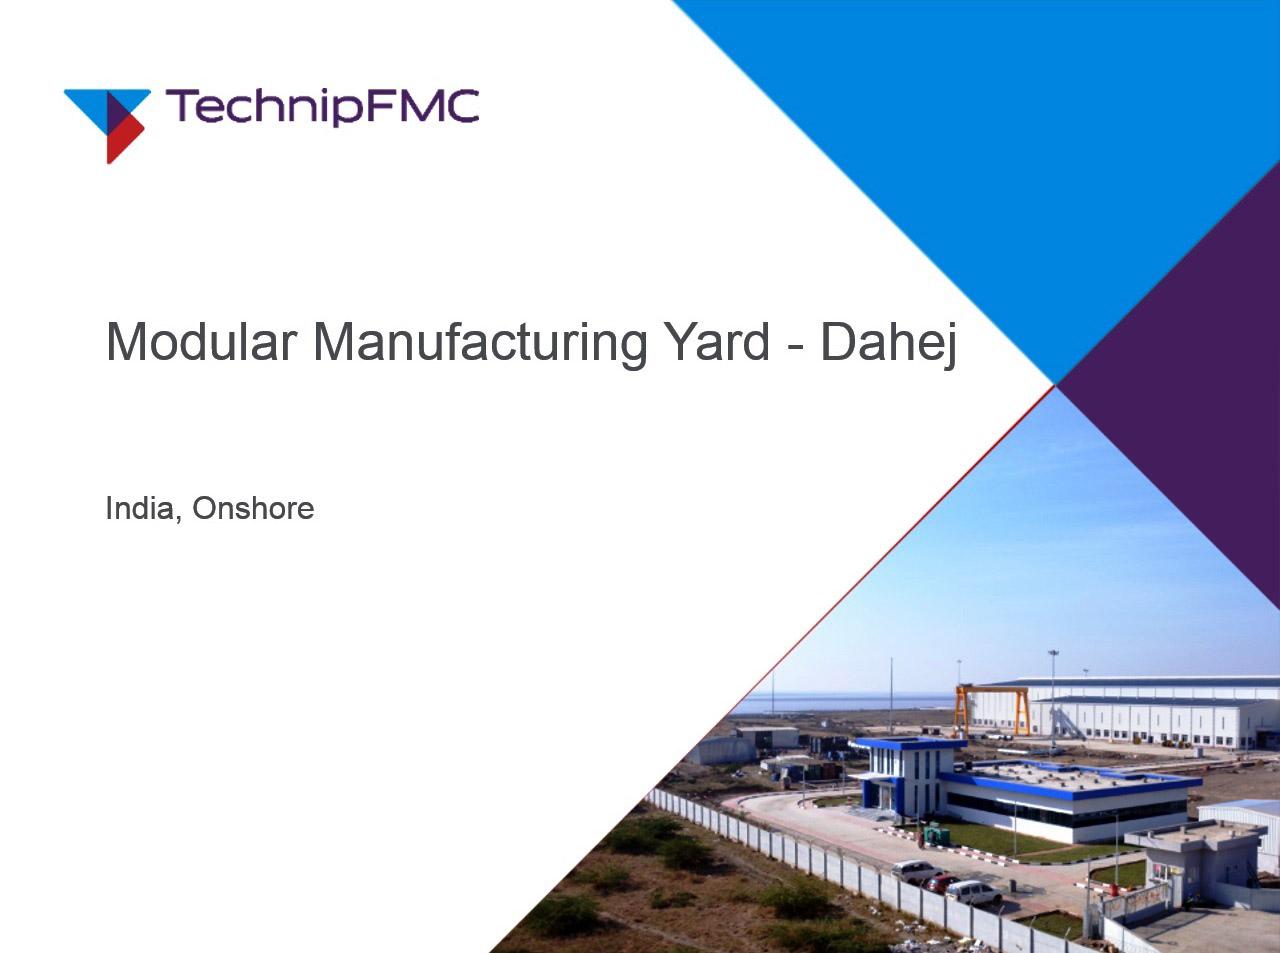 TechnipFMC Modular Manufacturing Yard at Dahej, Gujarat